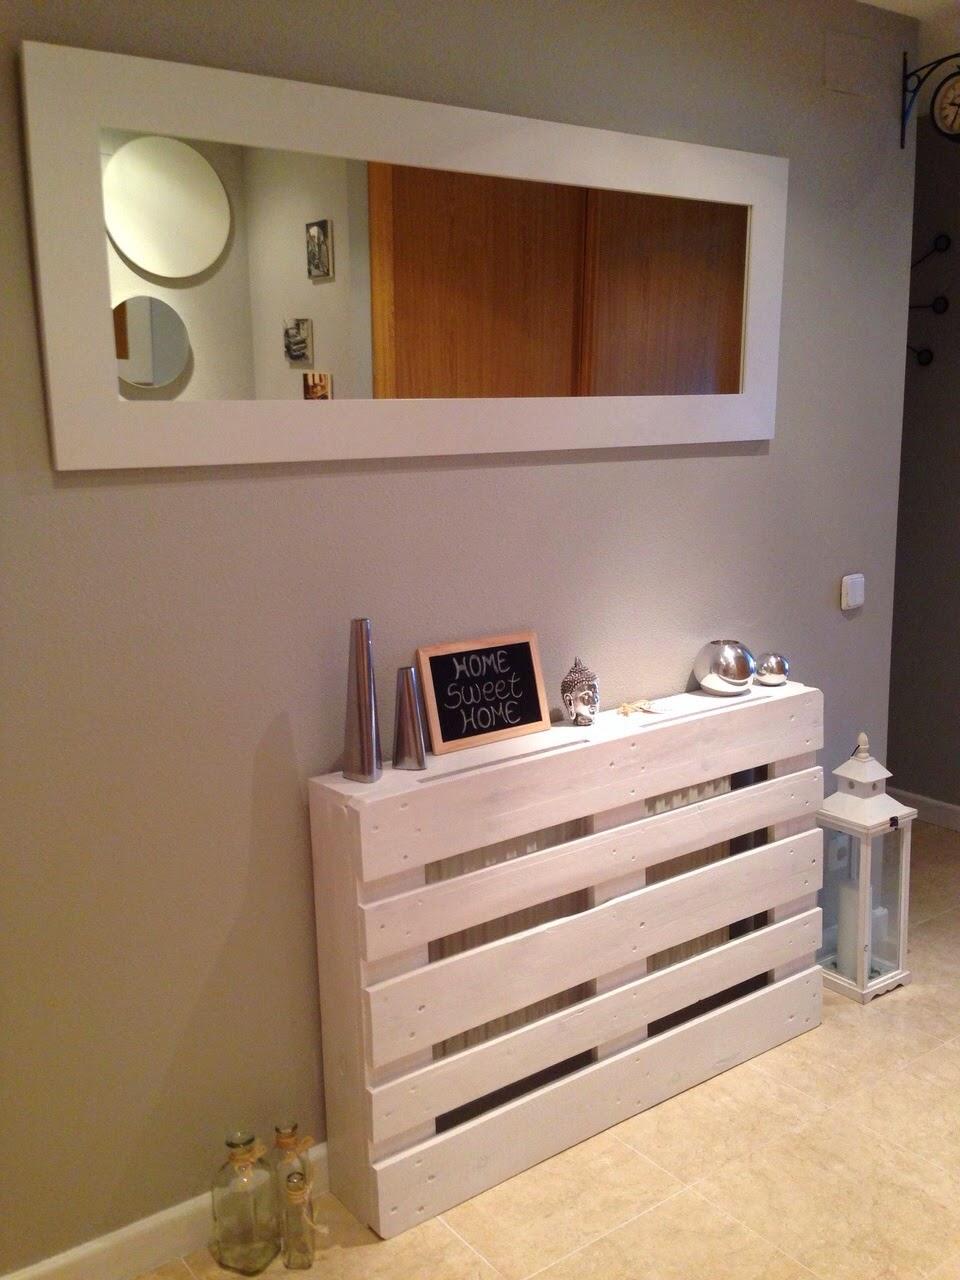 World styles - Mueble para radiador ...